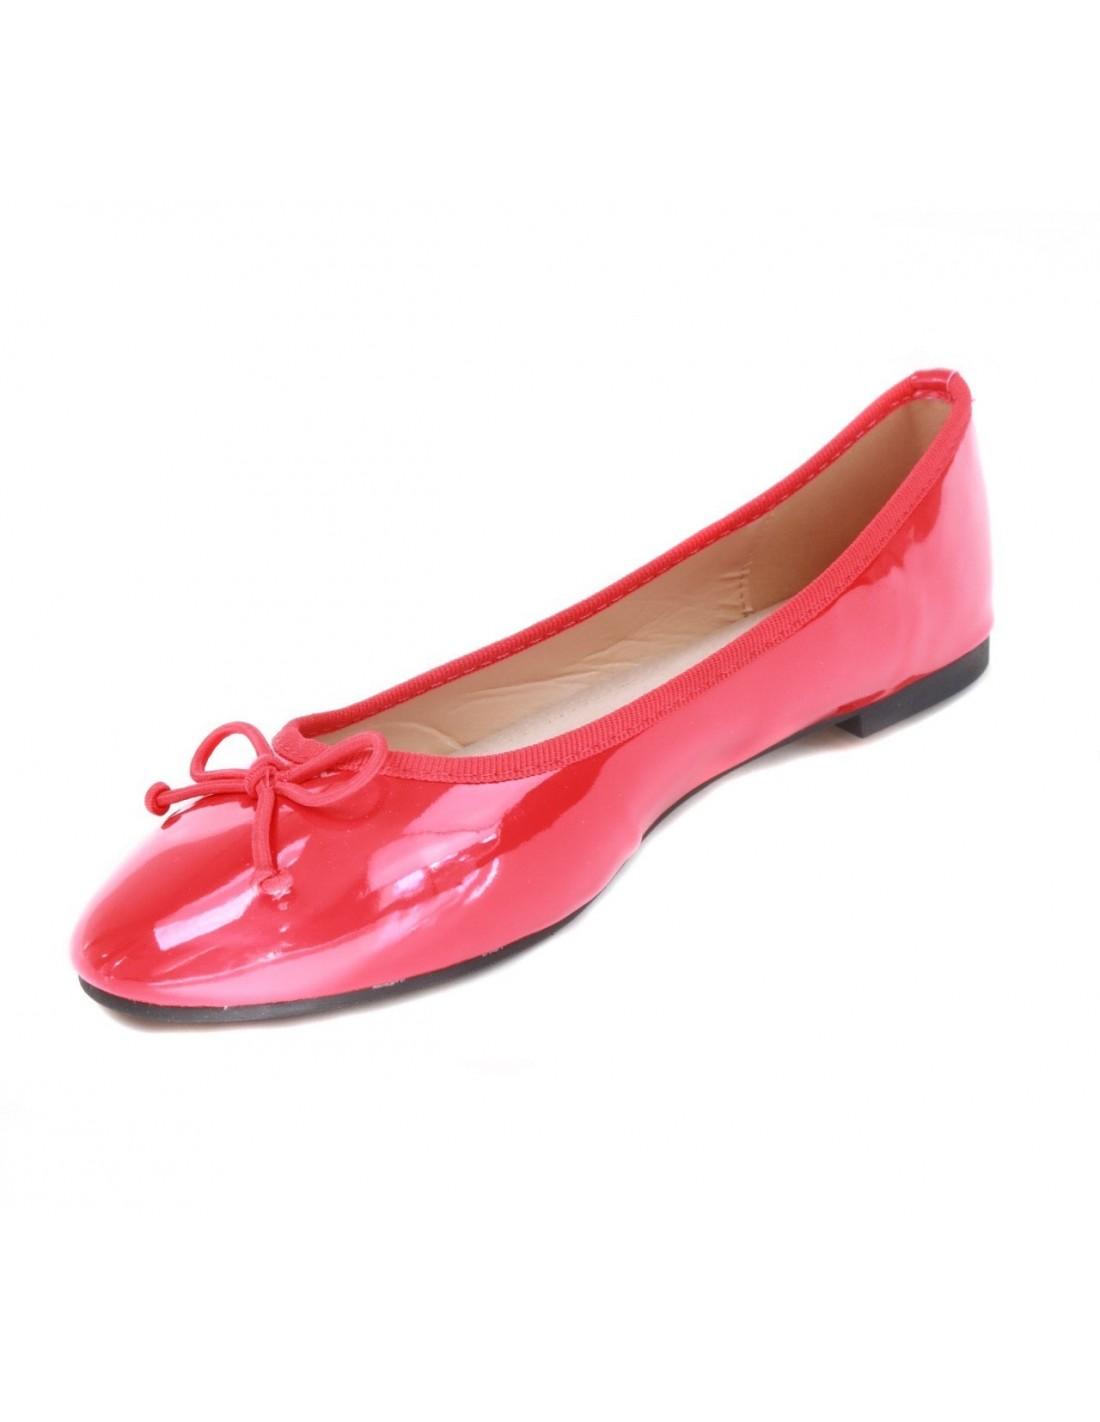 ballerines femme pas cher rouge vernis avec semelle en cuir. Black Bedroom Furniture Sets. Home Design Ideas